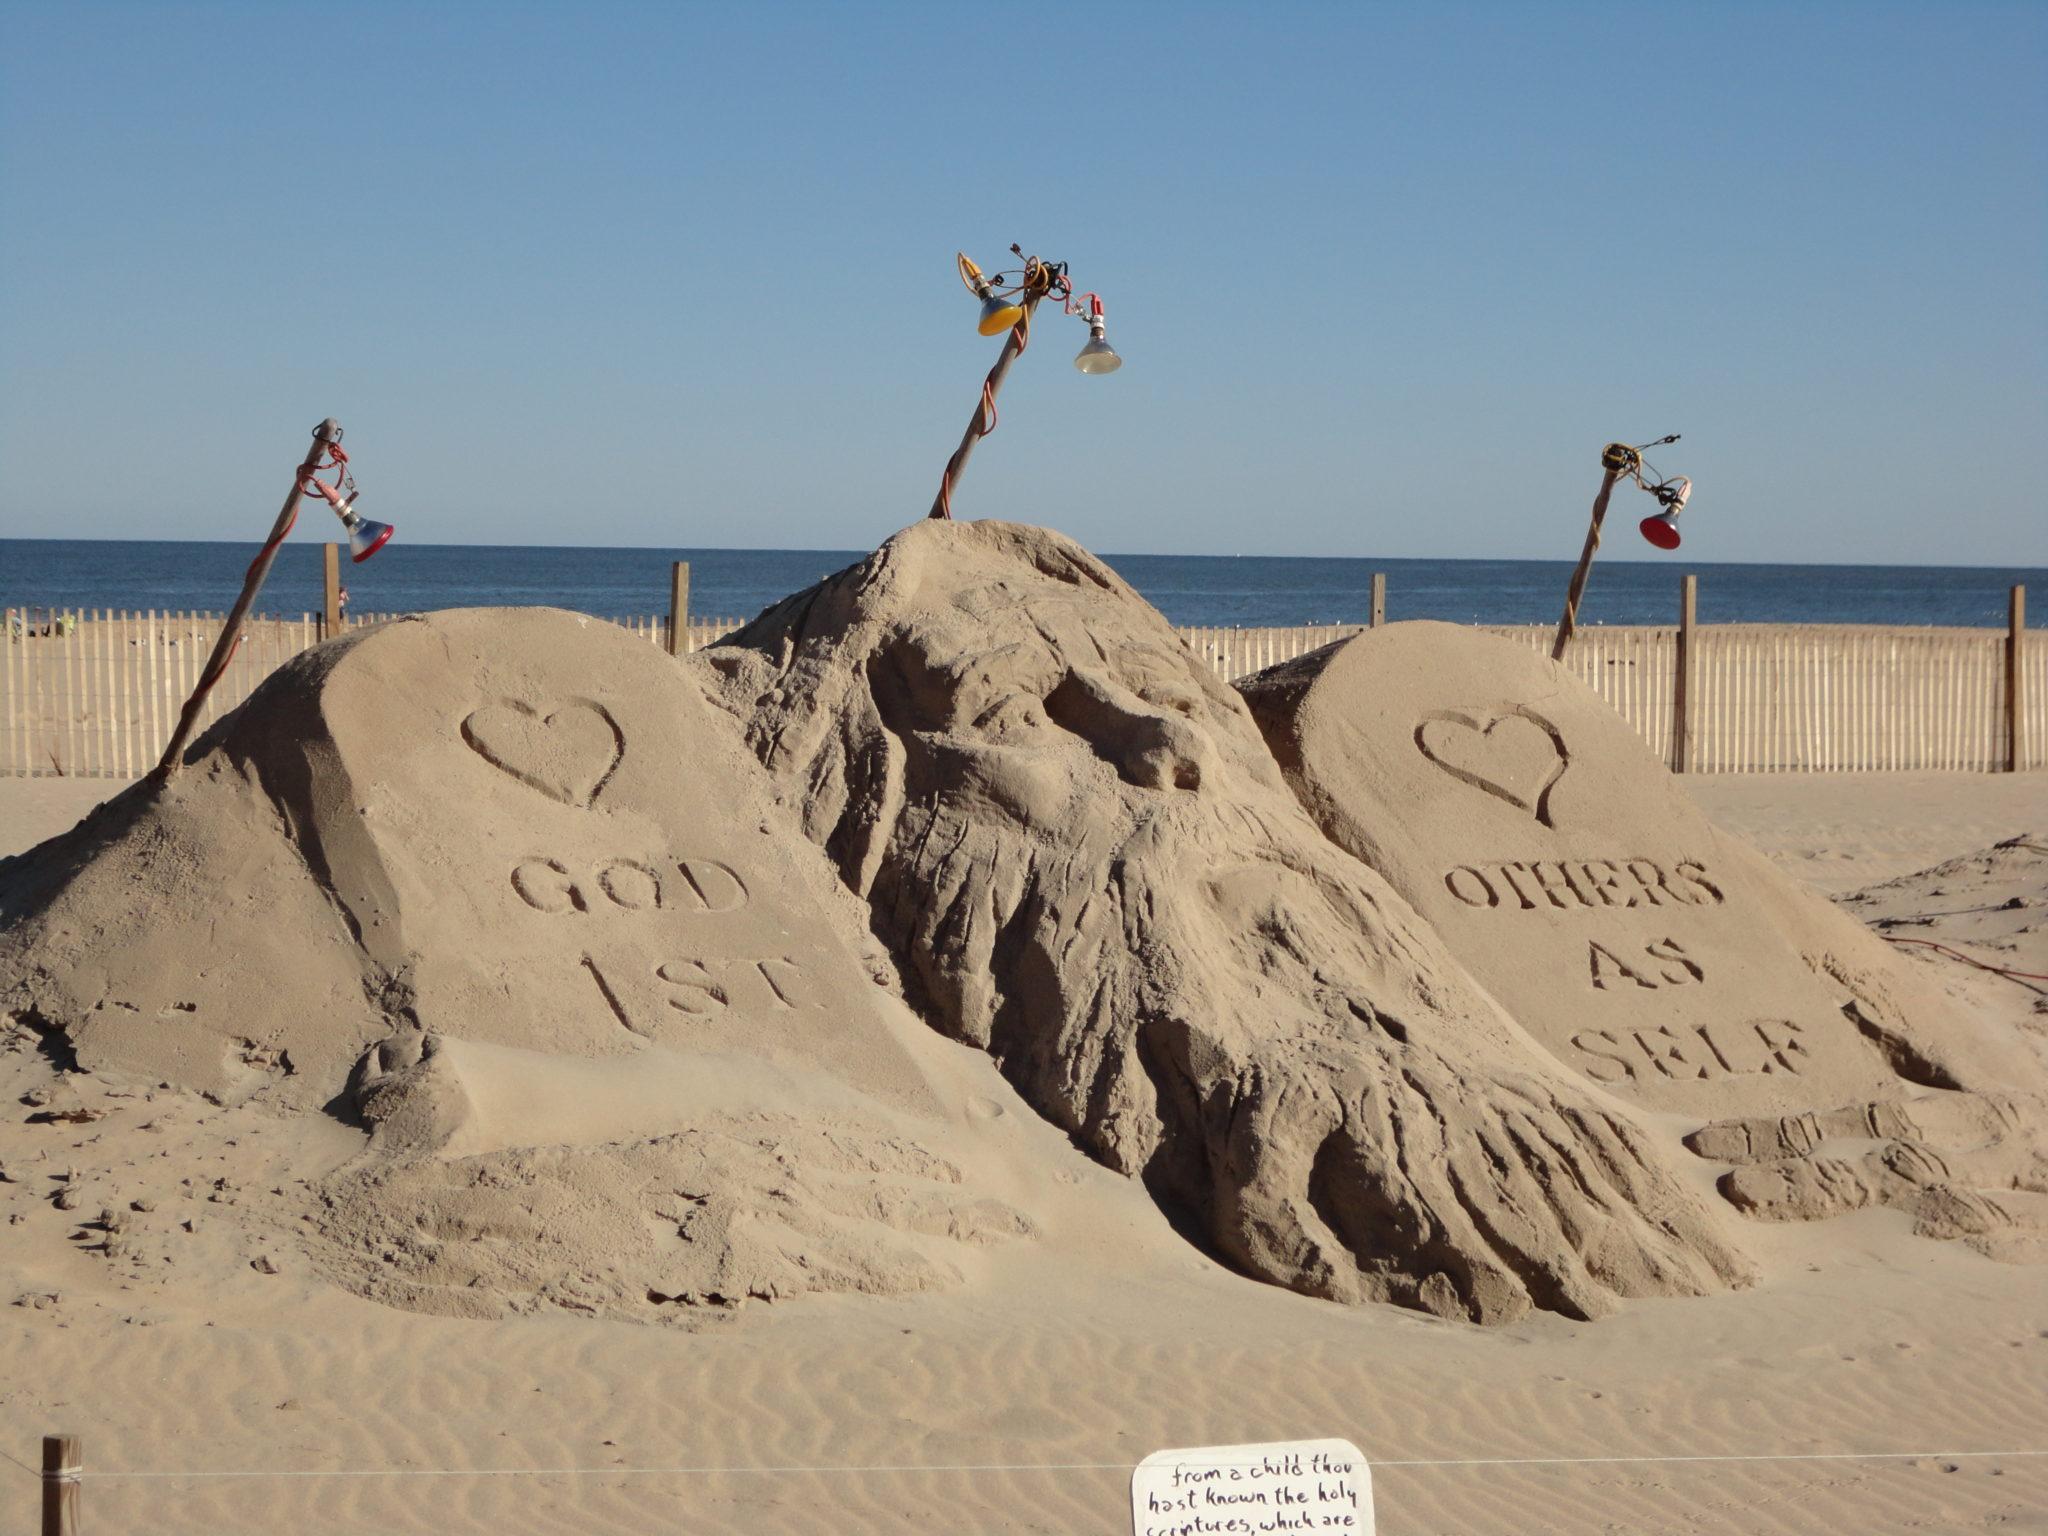 Sand sculpture in Ocean City MD